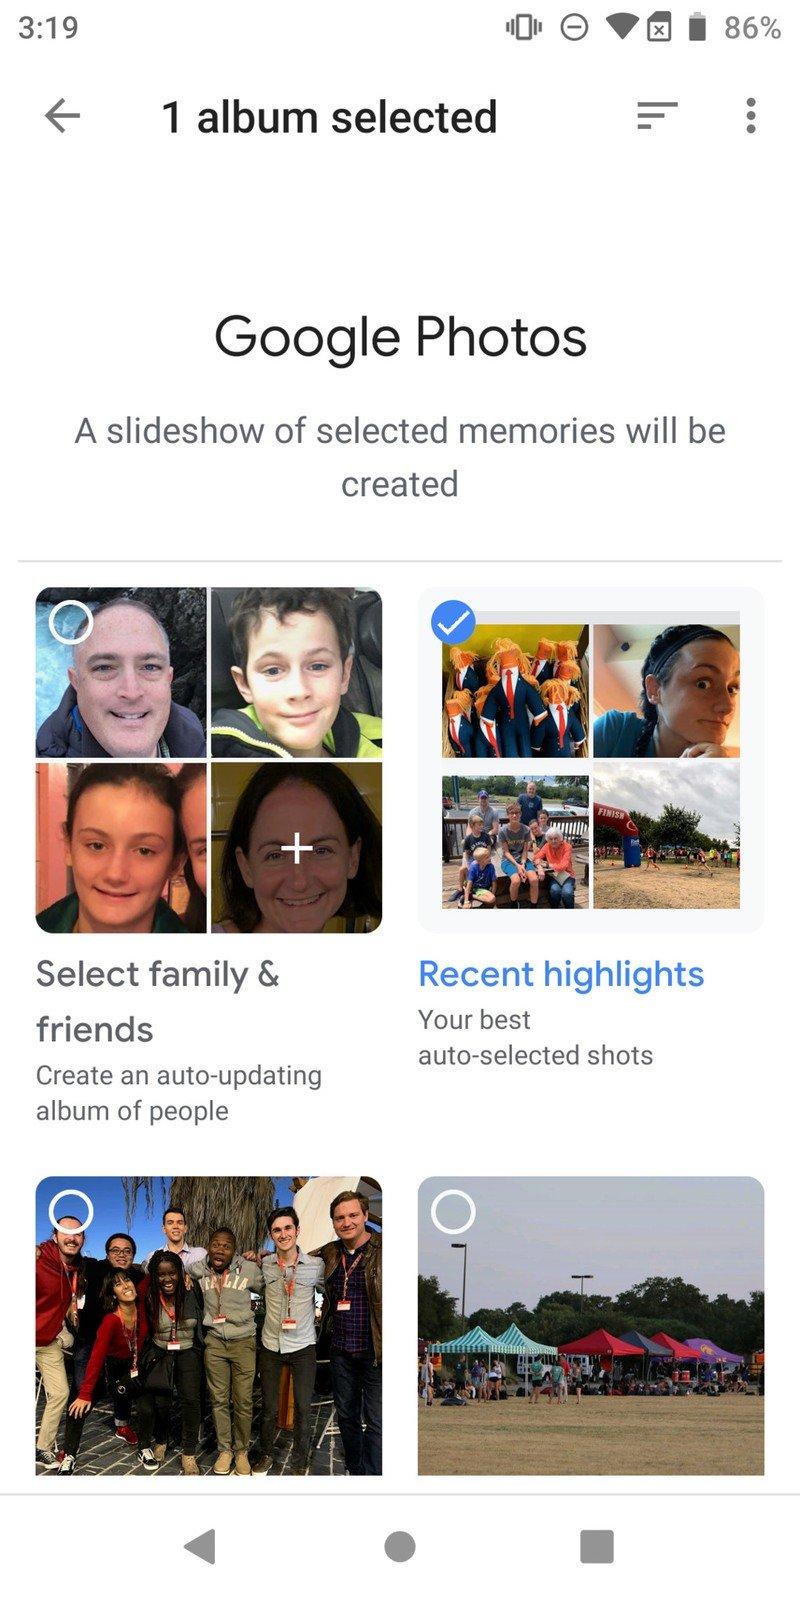 google-photos-app-5.jpg?itok=1Zzoh-Dm